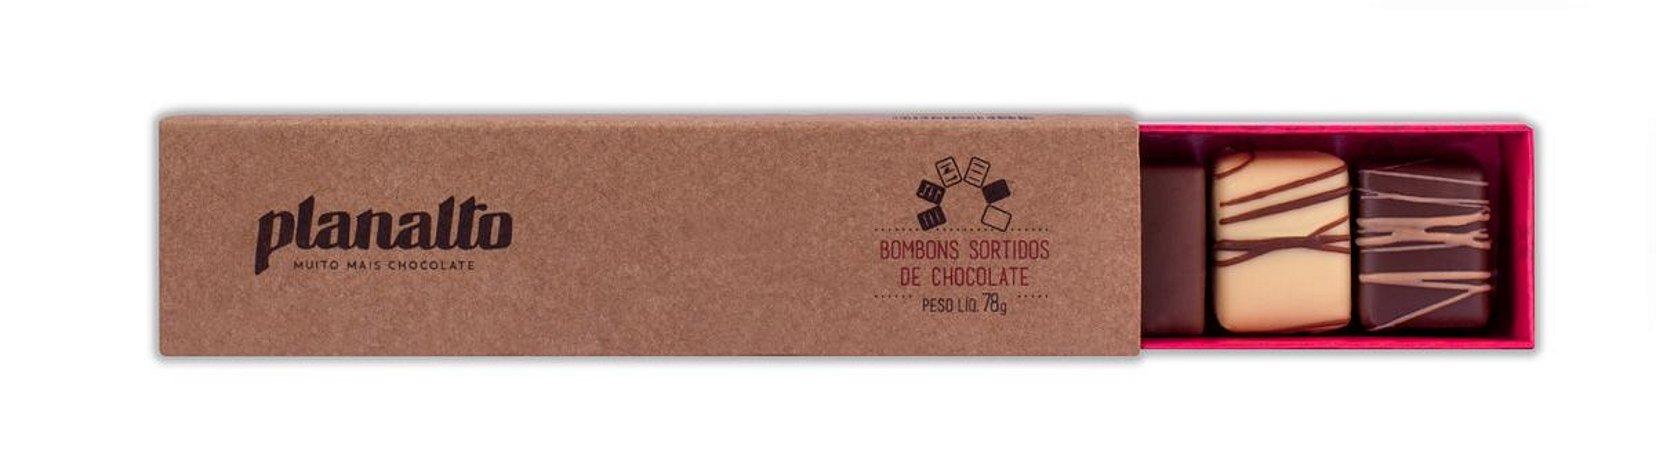 Bombons Sortidos de Chocolate